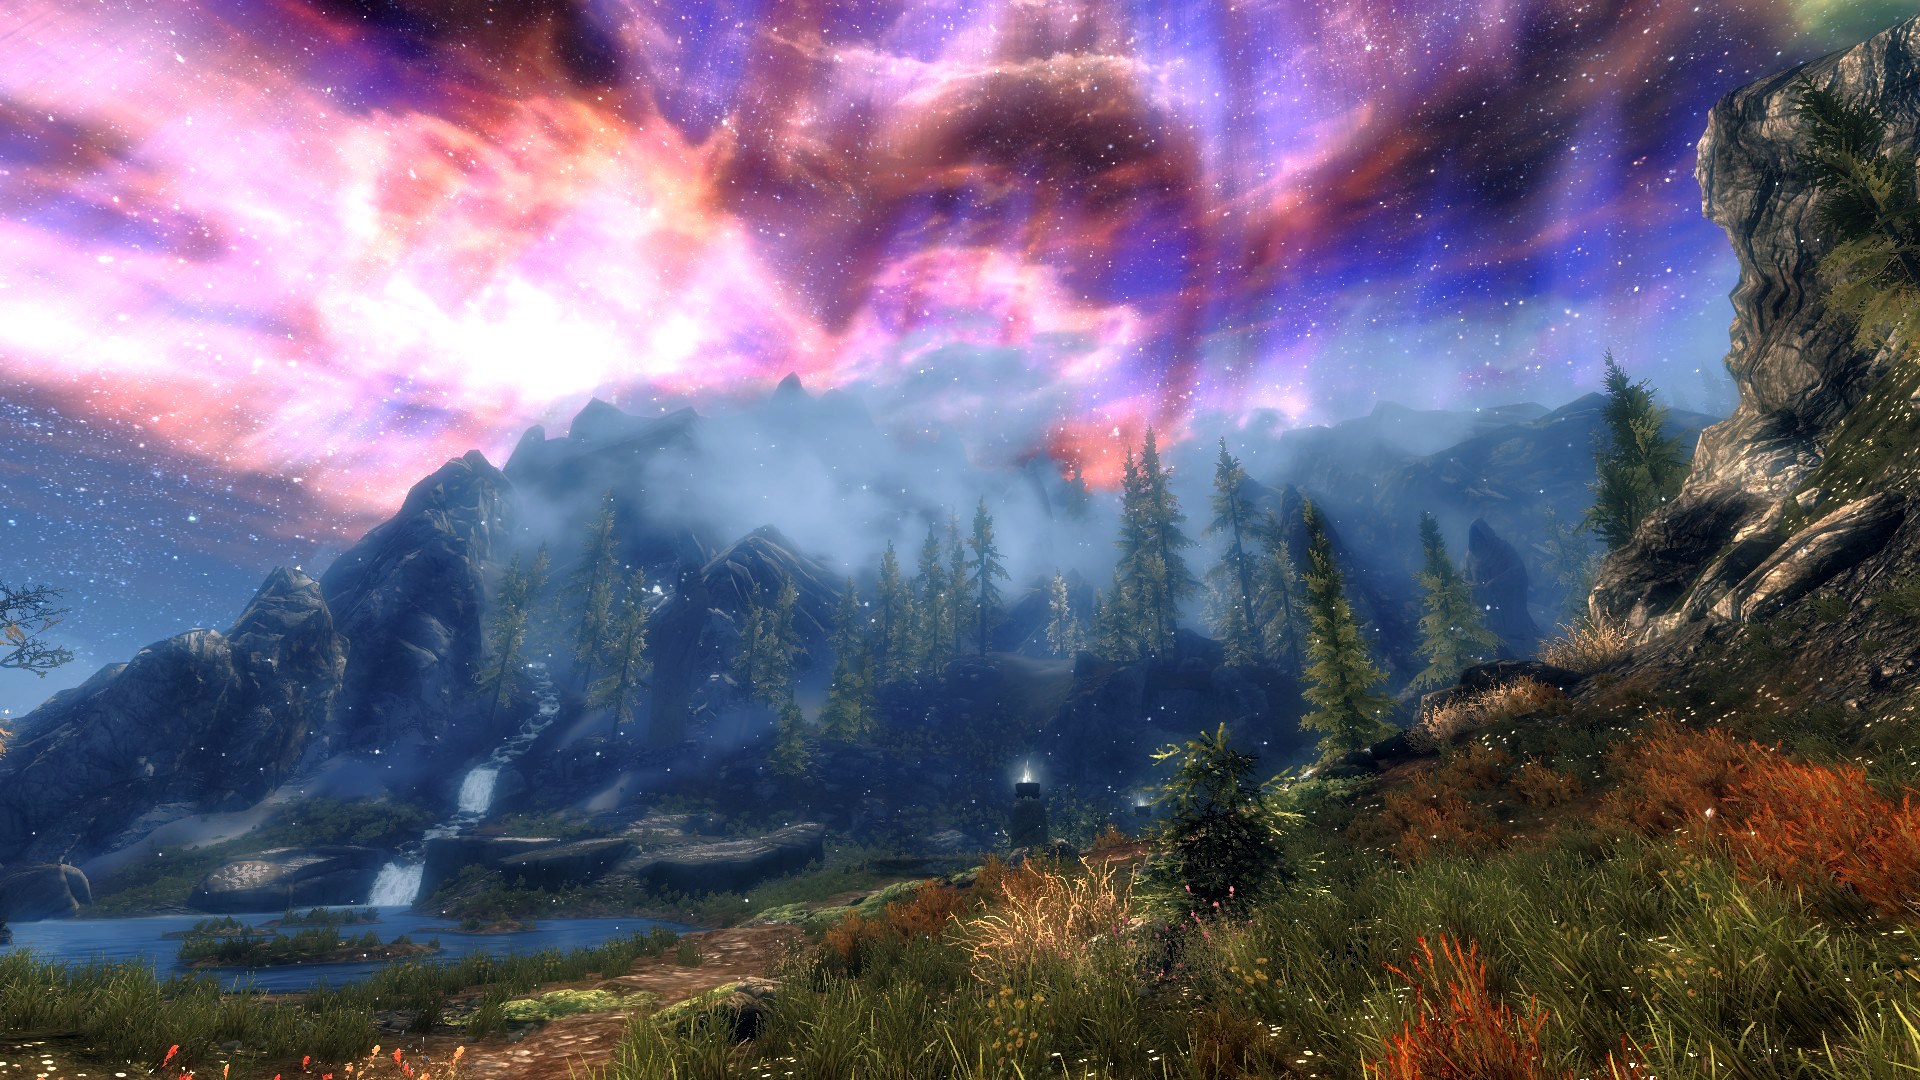 The elder scrolls v skyrim full hd sfondo and sfondo for Aurora boreale sfondo